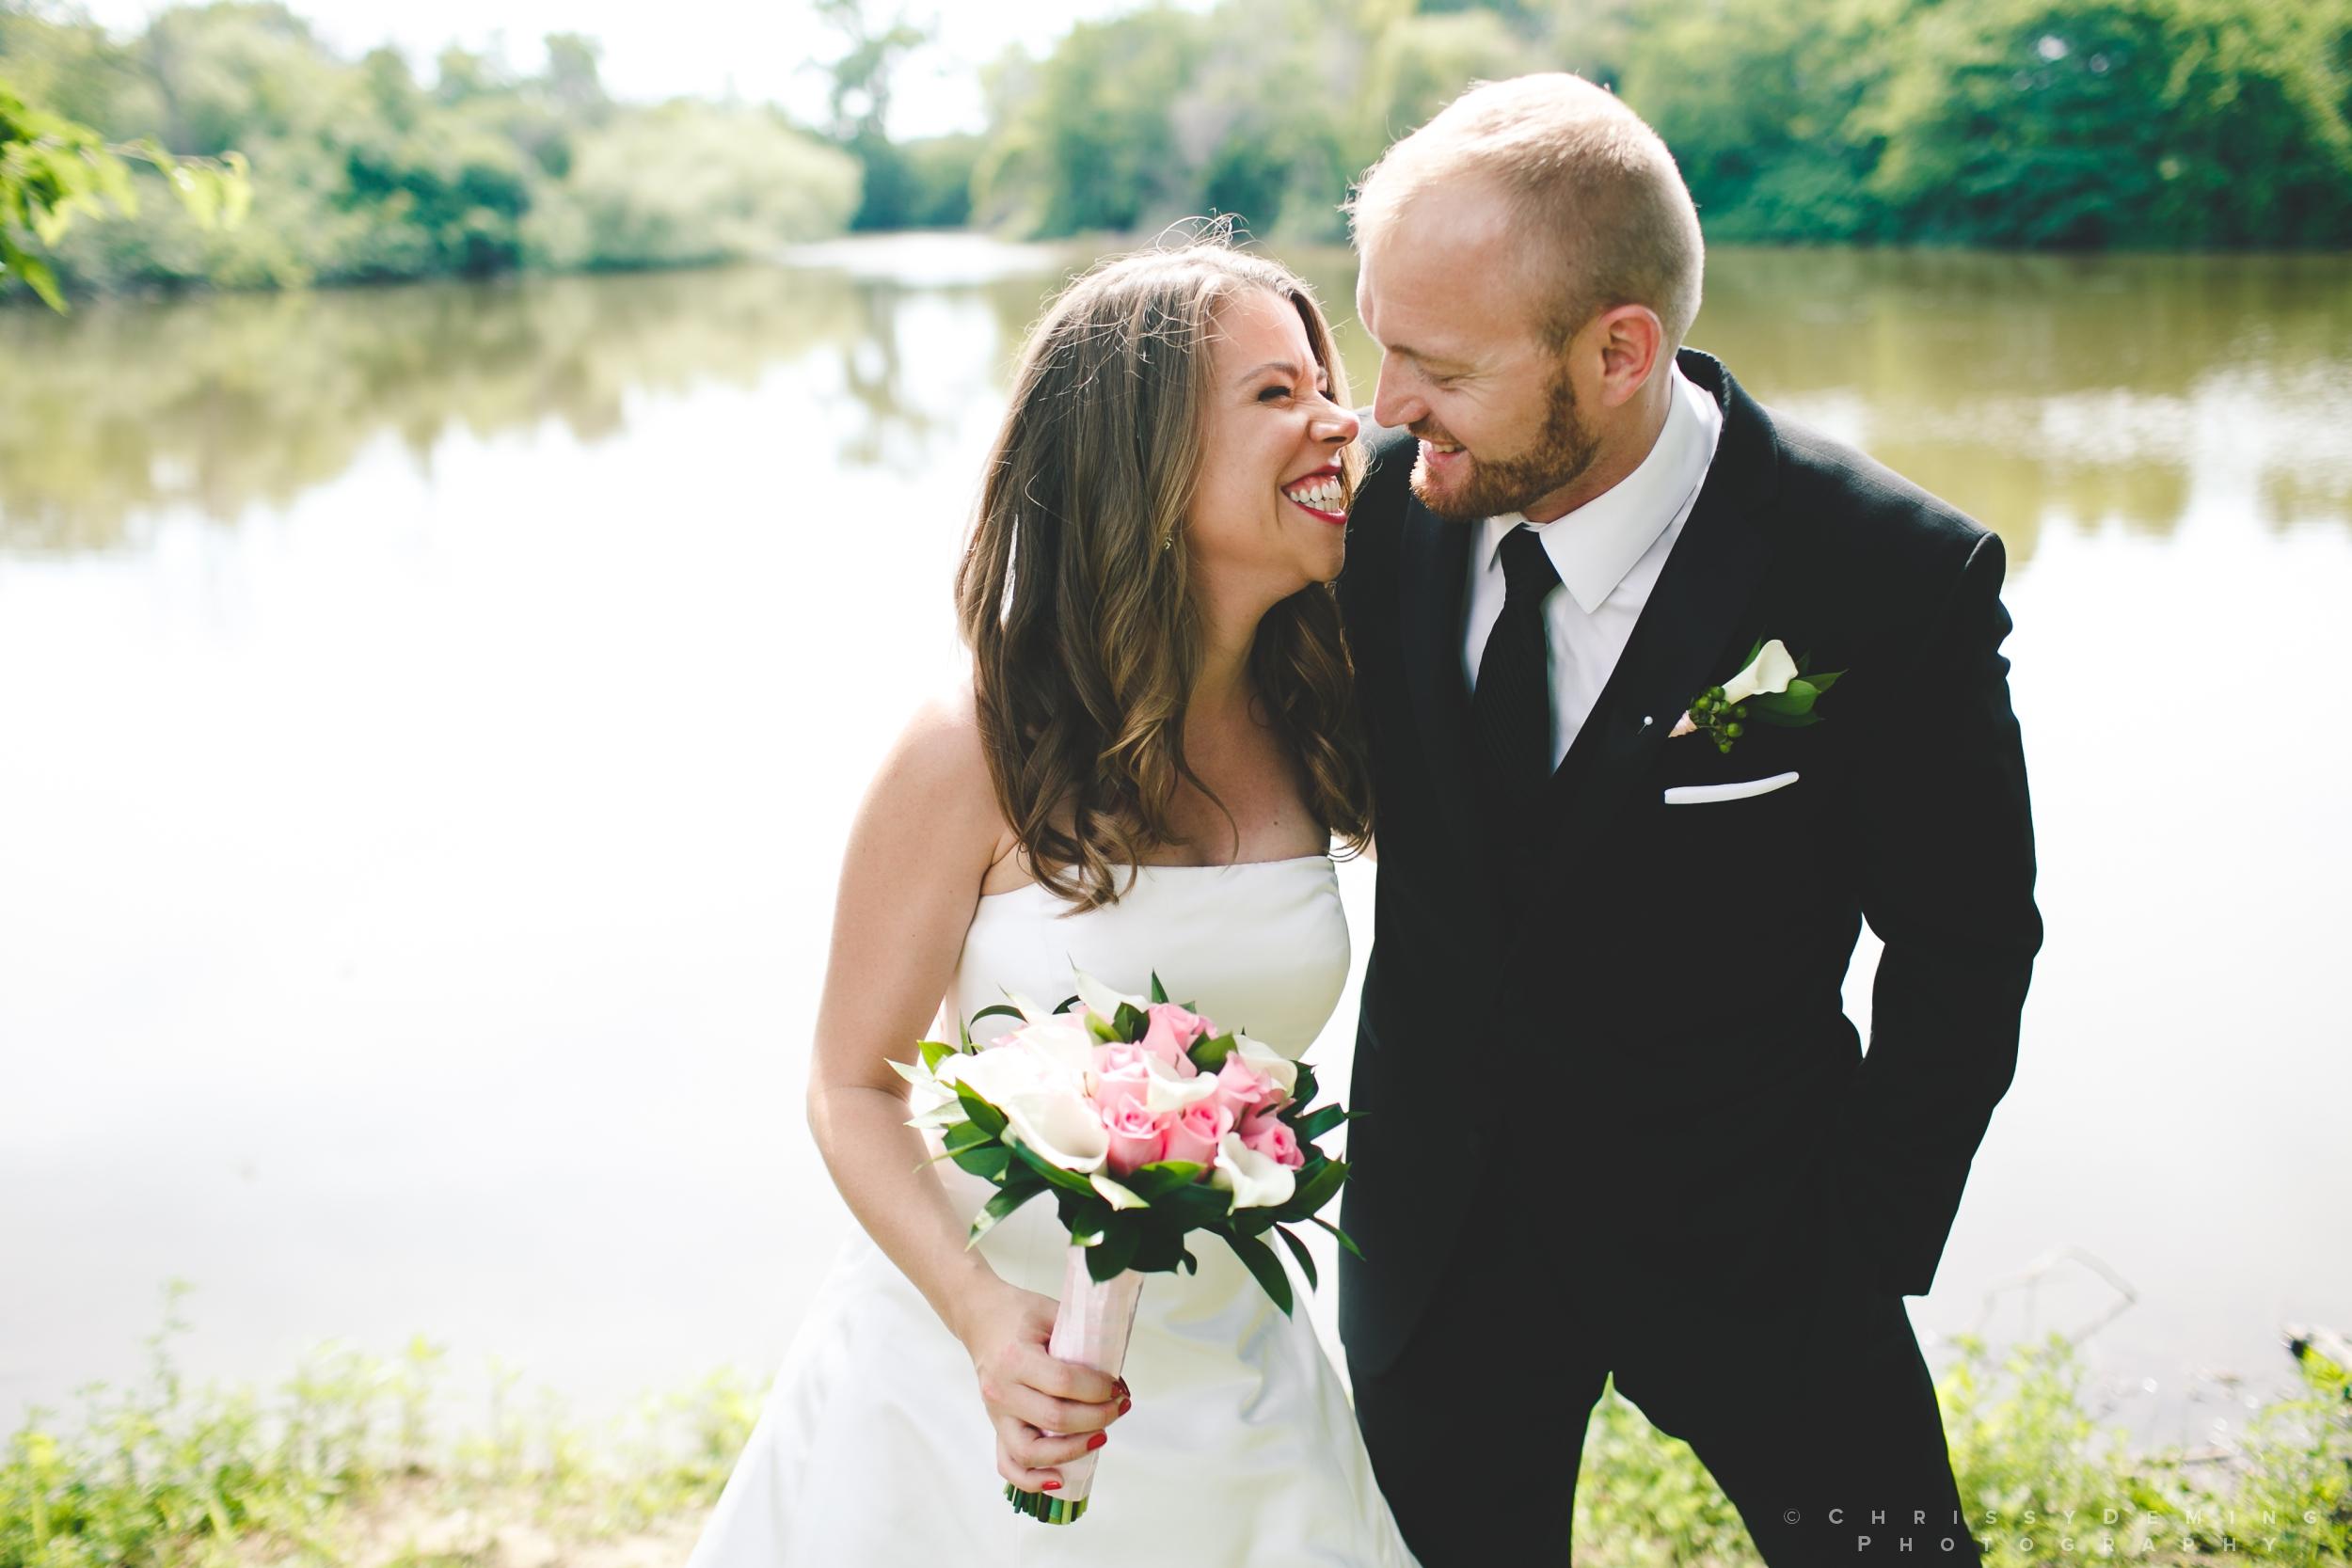 benedictine_lisle_wedding_photographer_0015.jpg